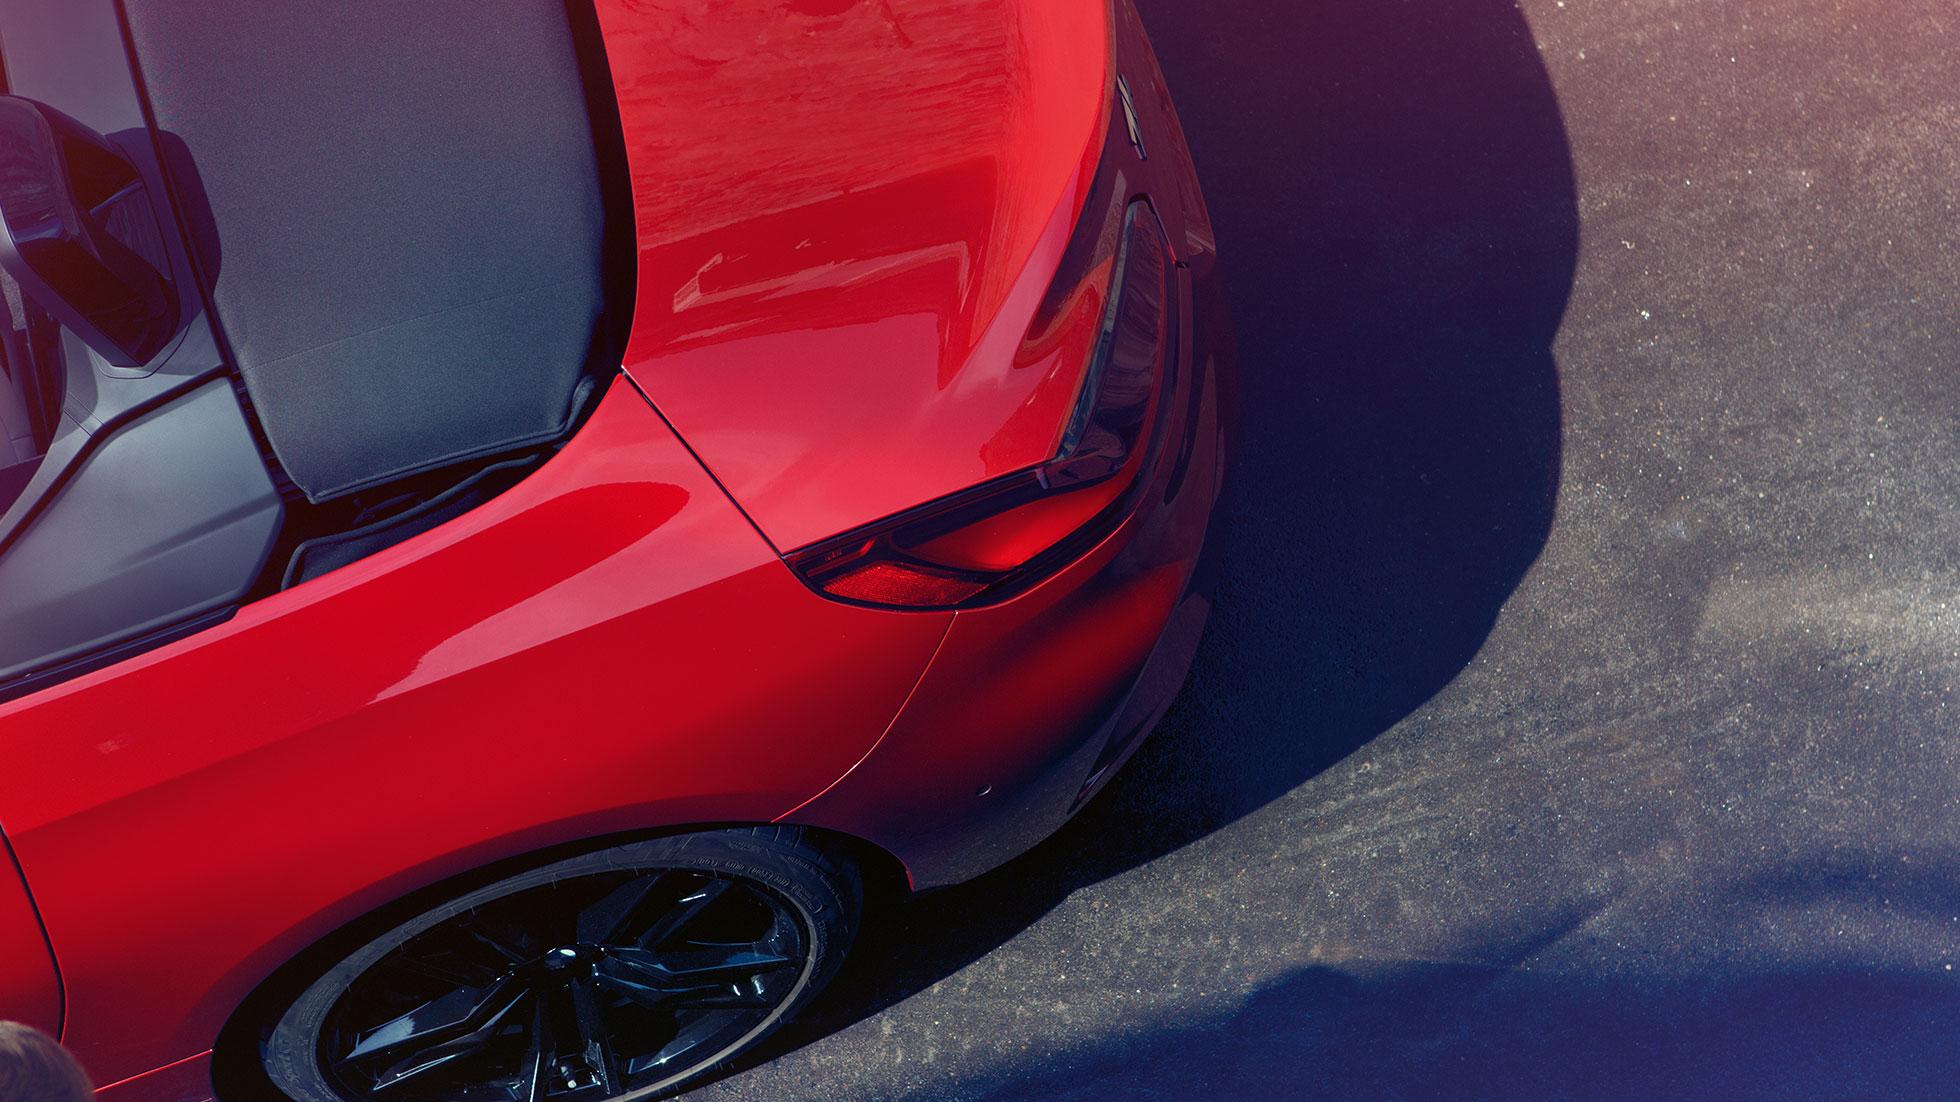 BMW Z4 Roadster, вид сверху и сзади, заднее колесо